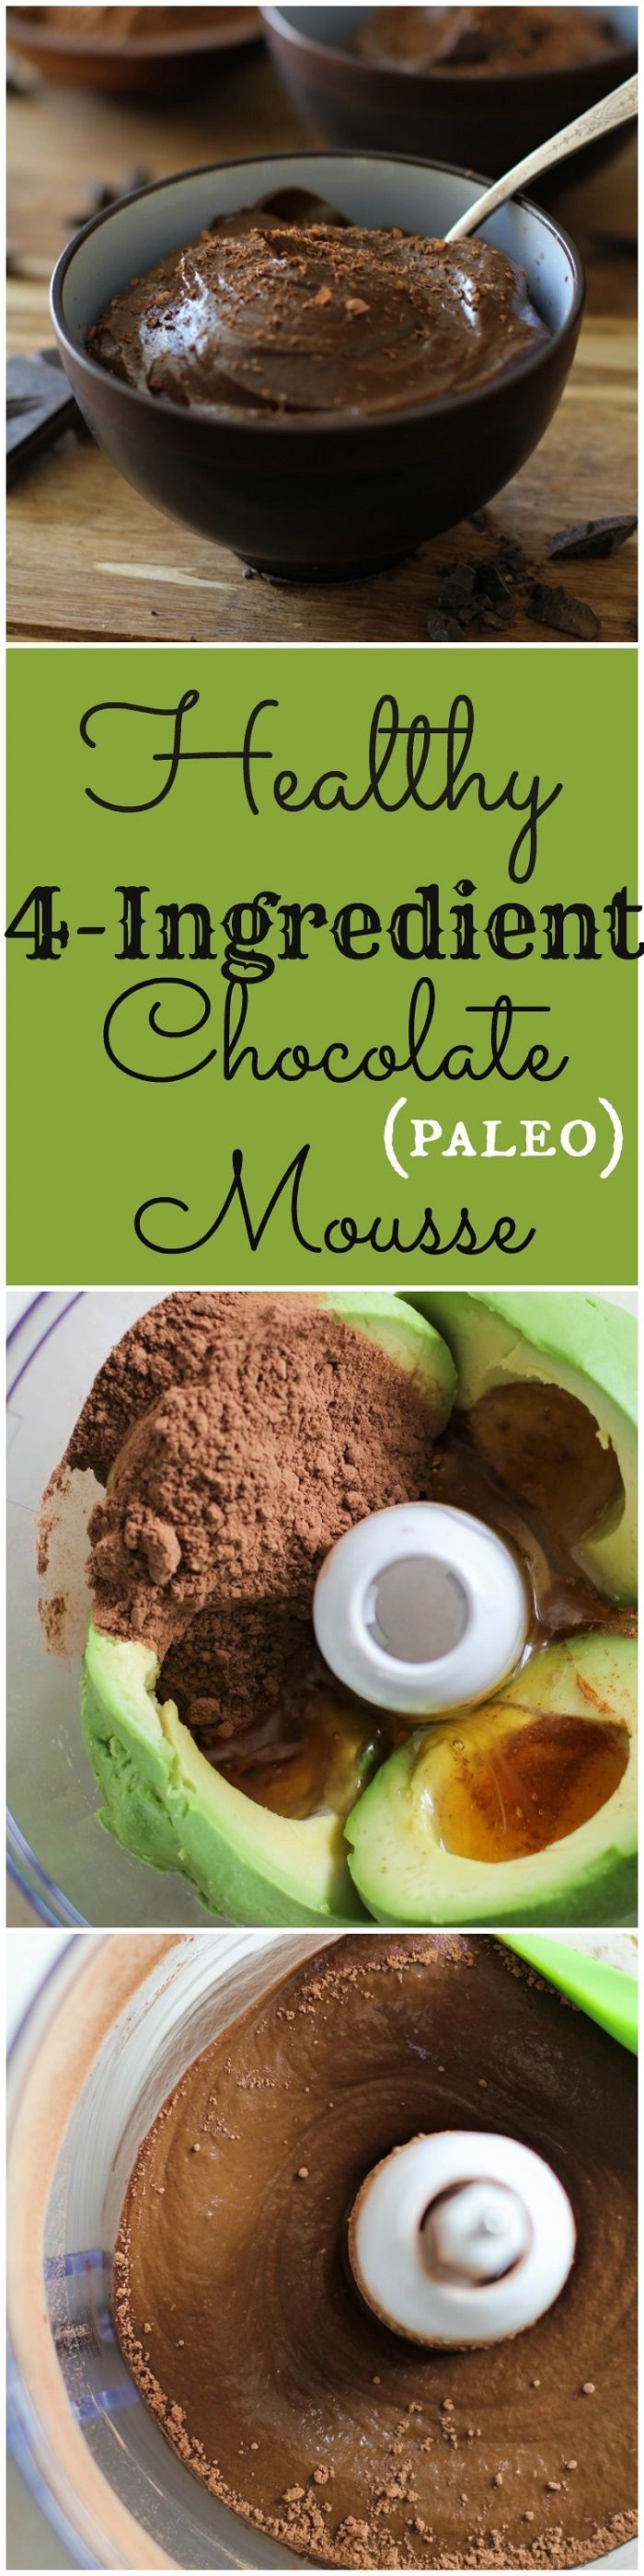 Healthy 4-Ingredient Chocolate Mousse | http://TheRoastedRoot.net #recipe #dessert #paleo